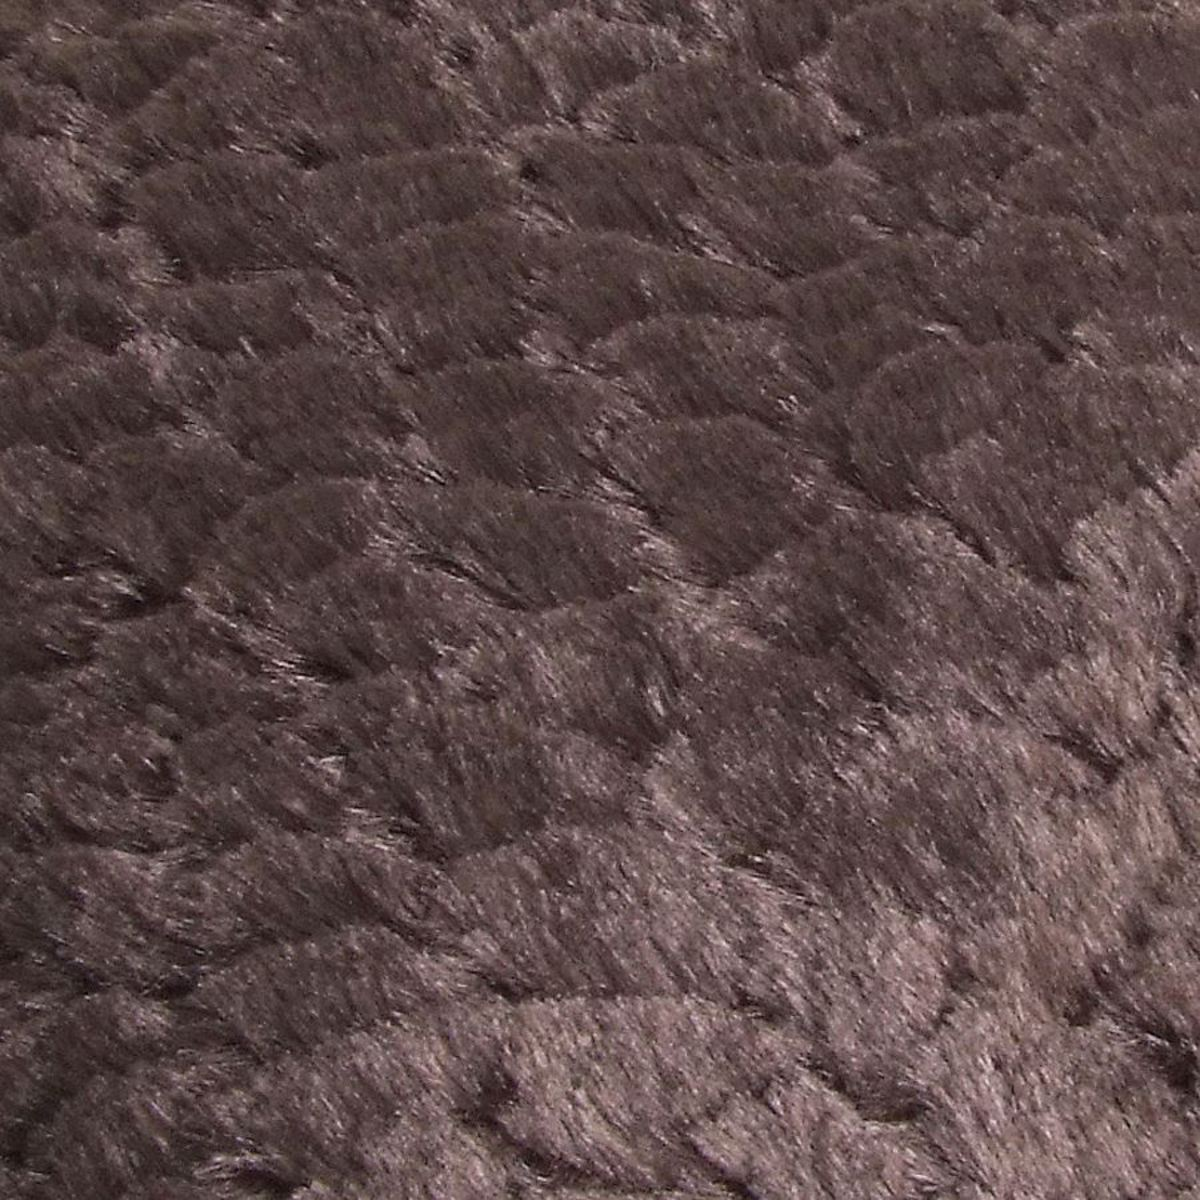 Bild 4 von Domo Tavola Fellimitat-Decke 150x200cm Braun